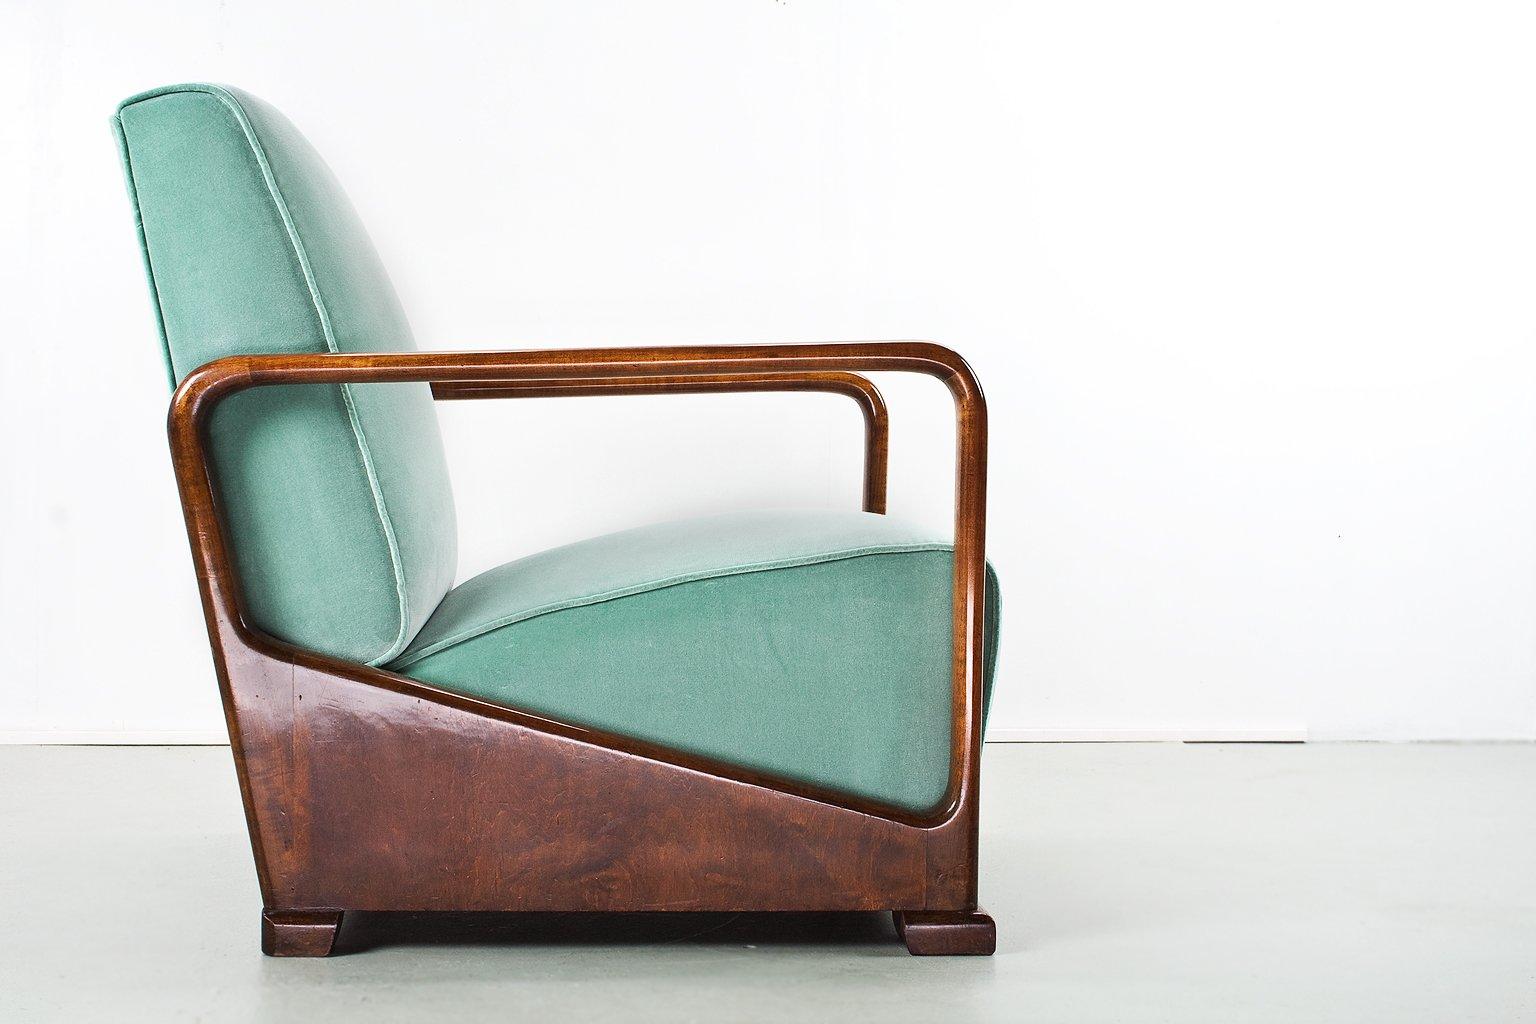 vintage art deco sessel aus ulmenholz samt bei pamono kaufen. Black Bedroom Furniture Sets. Home Design Ideas